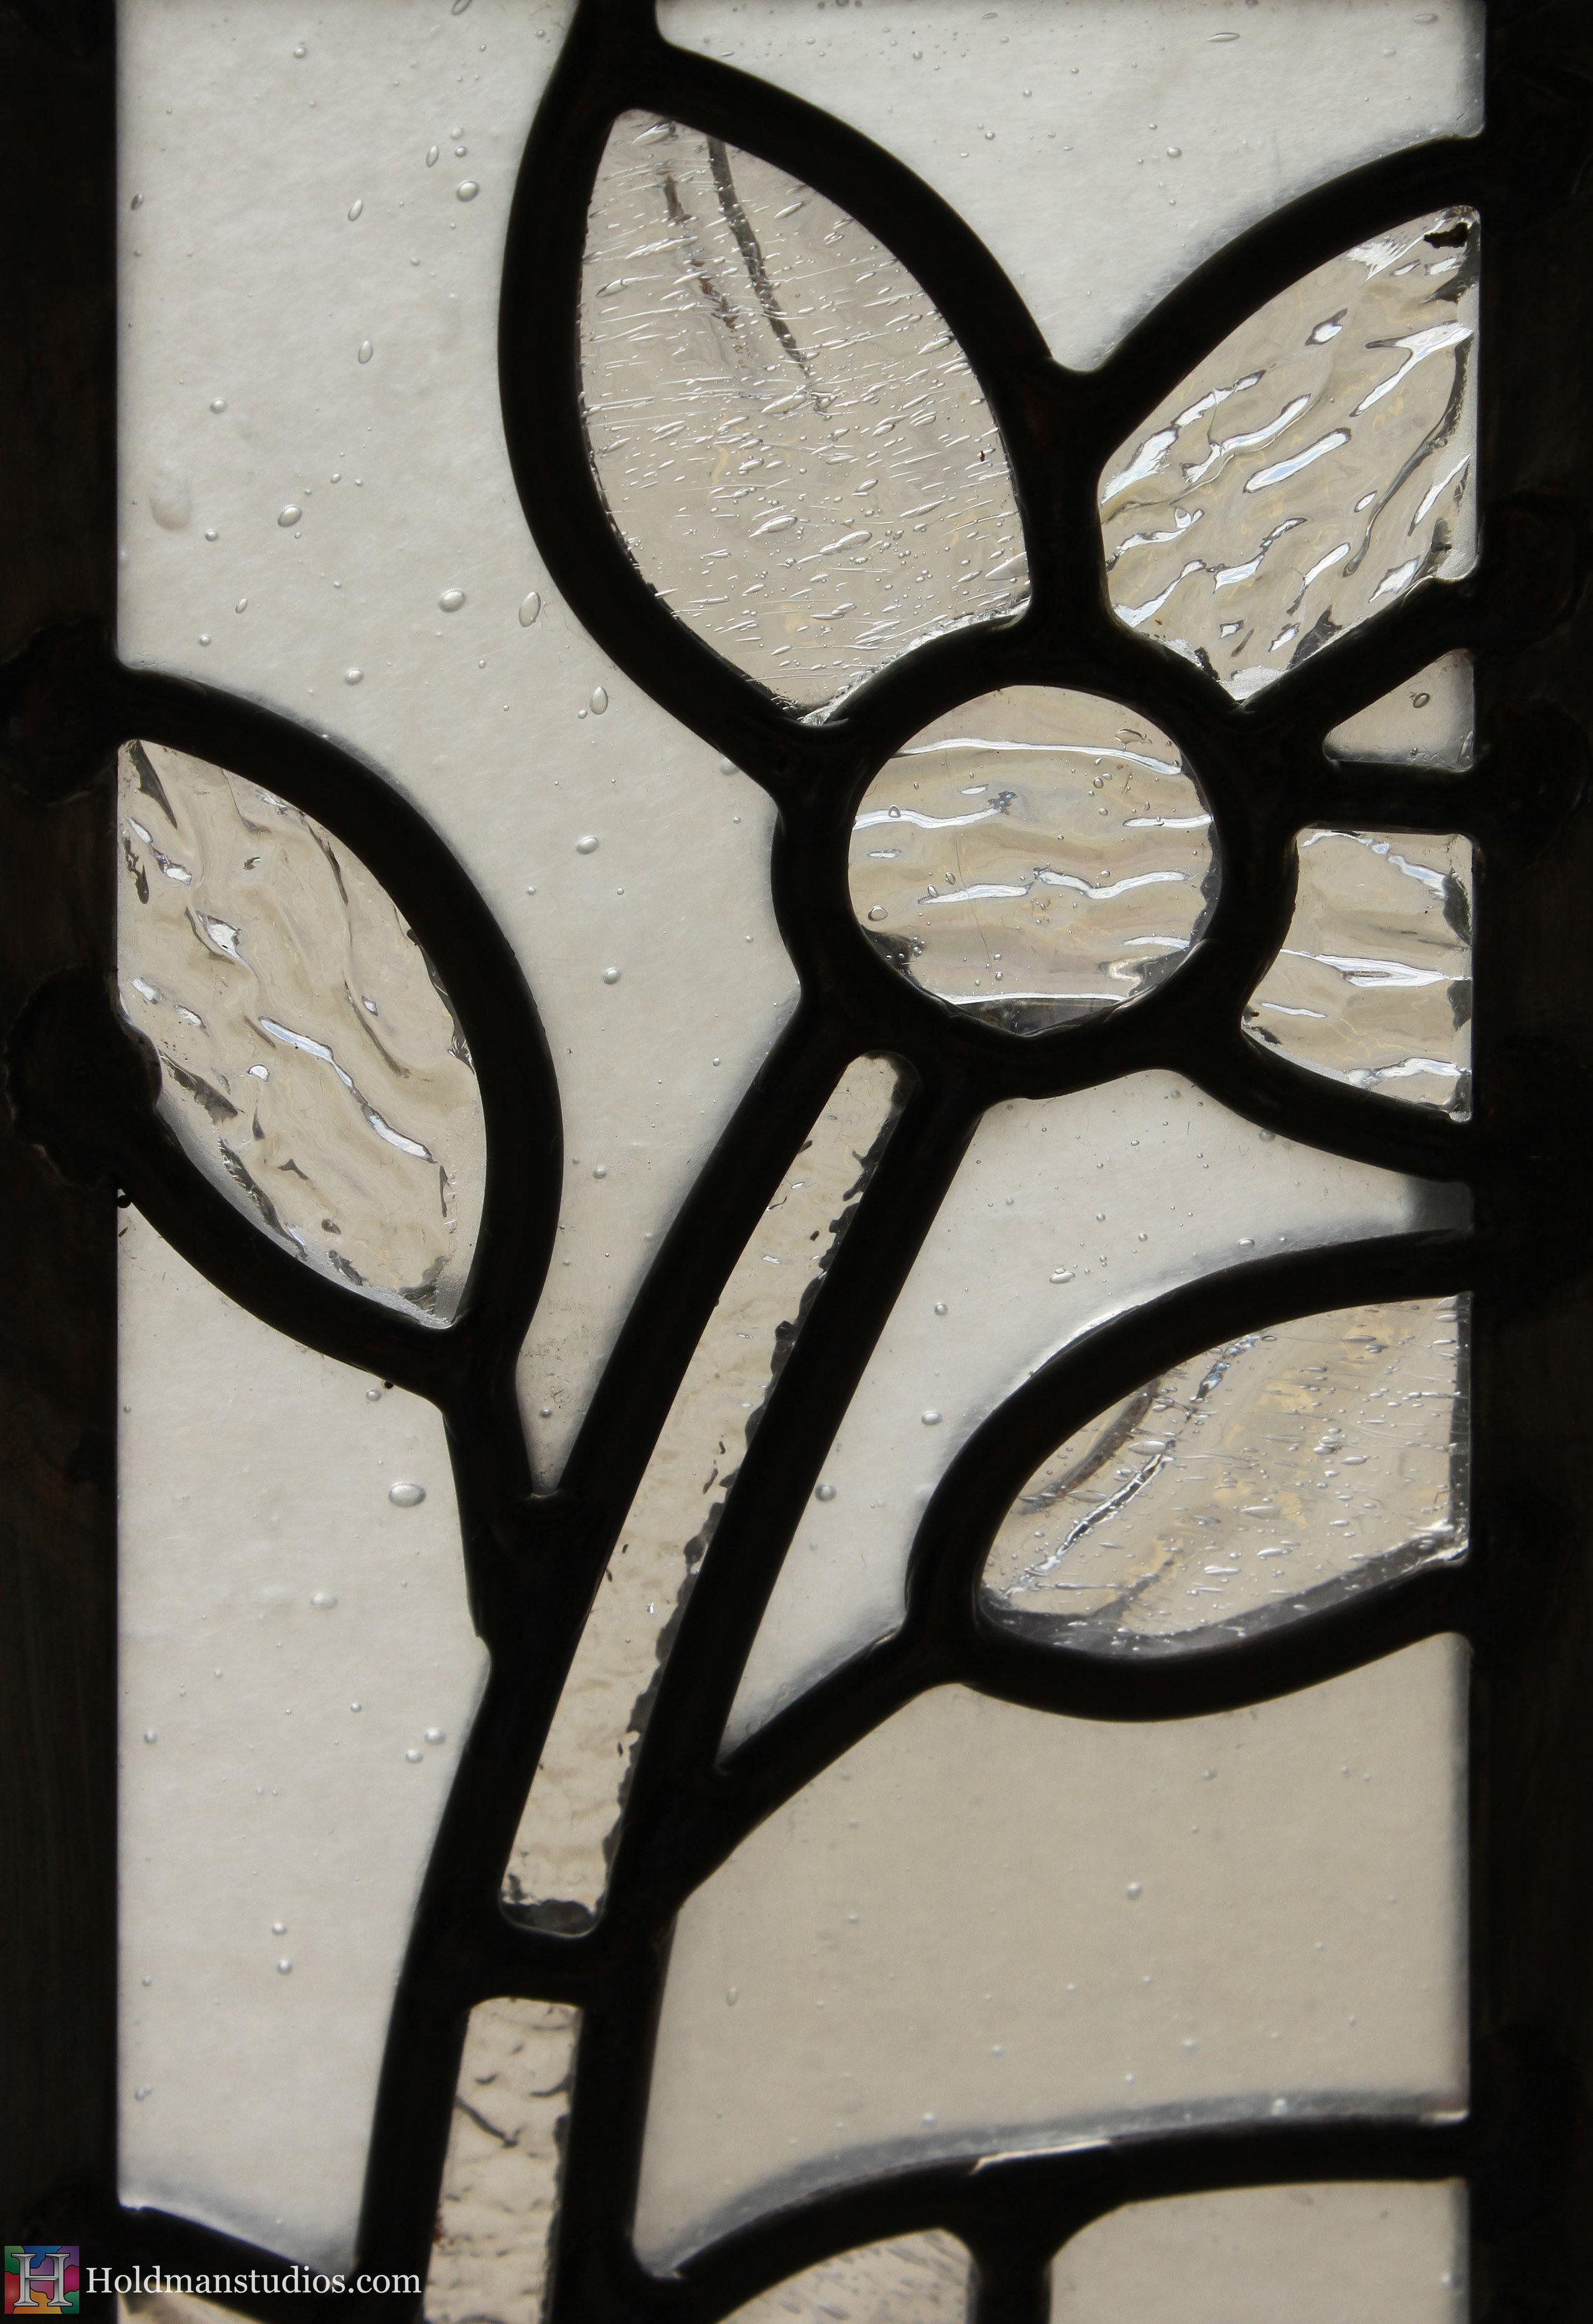 Holdman_Studios_Stained_Art_Glass_LDS_Mormon_Temple_Boise_Idaho_Potato_Flower_Window_Border_Closeup.jpg